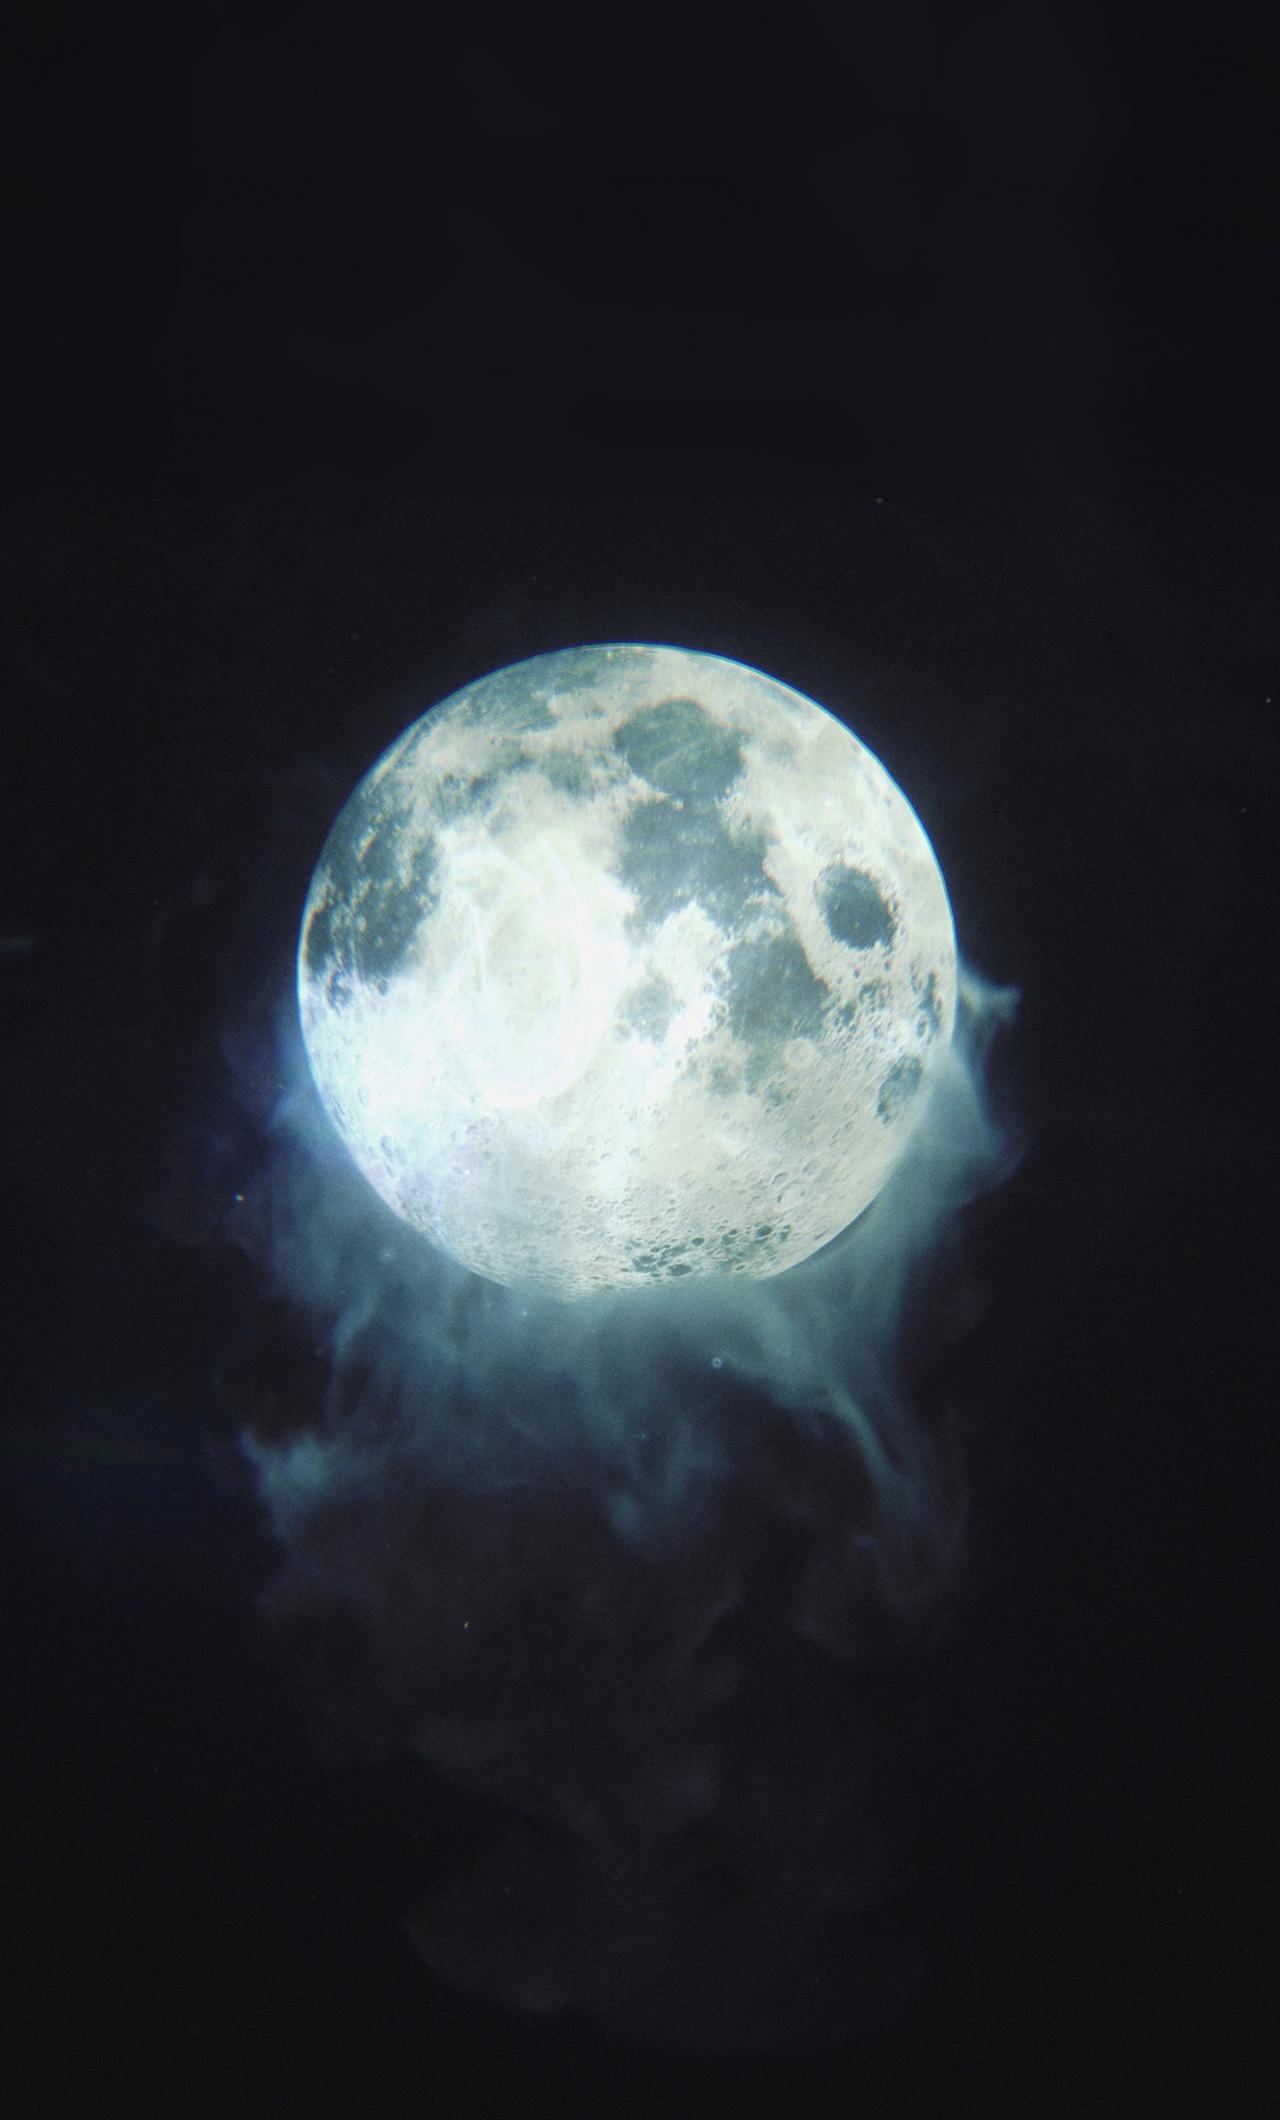 Download 1280x2120 Wallpaper Moon Glow Smoke Dark Iphone